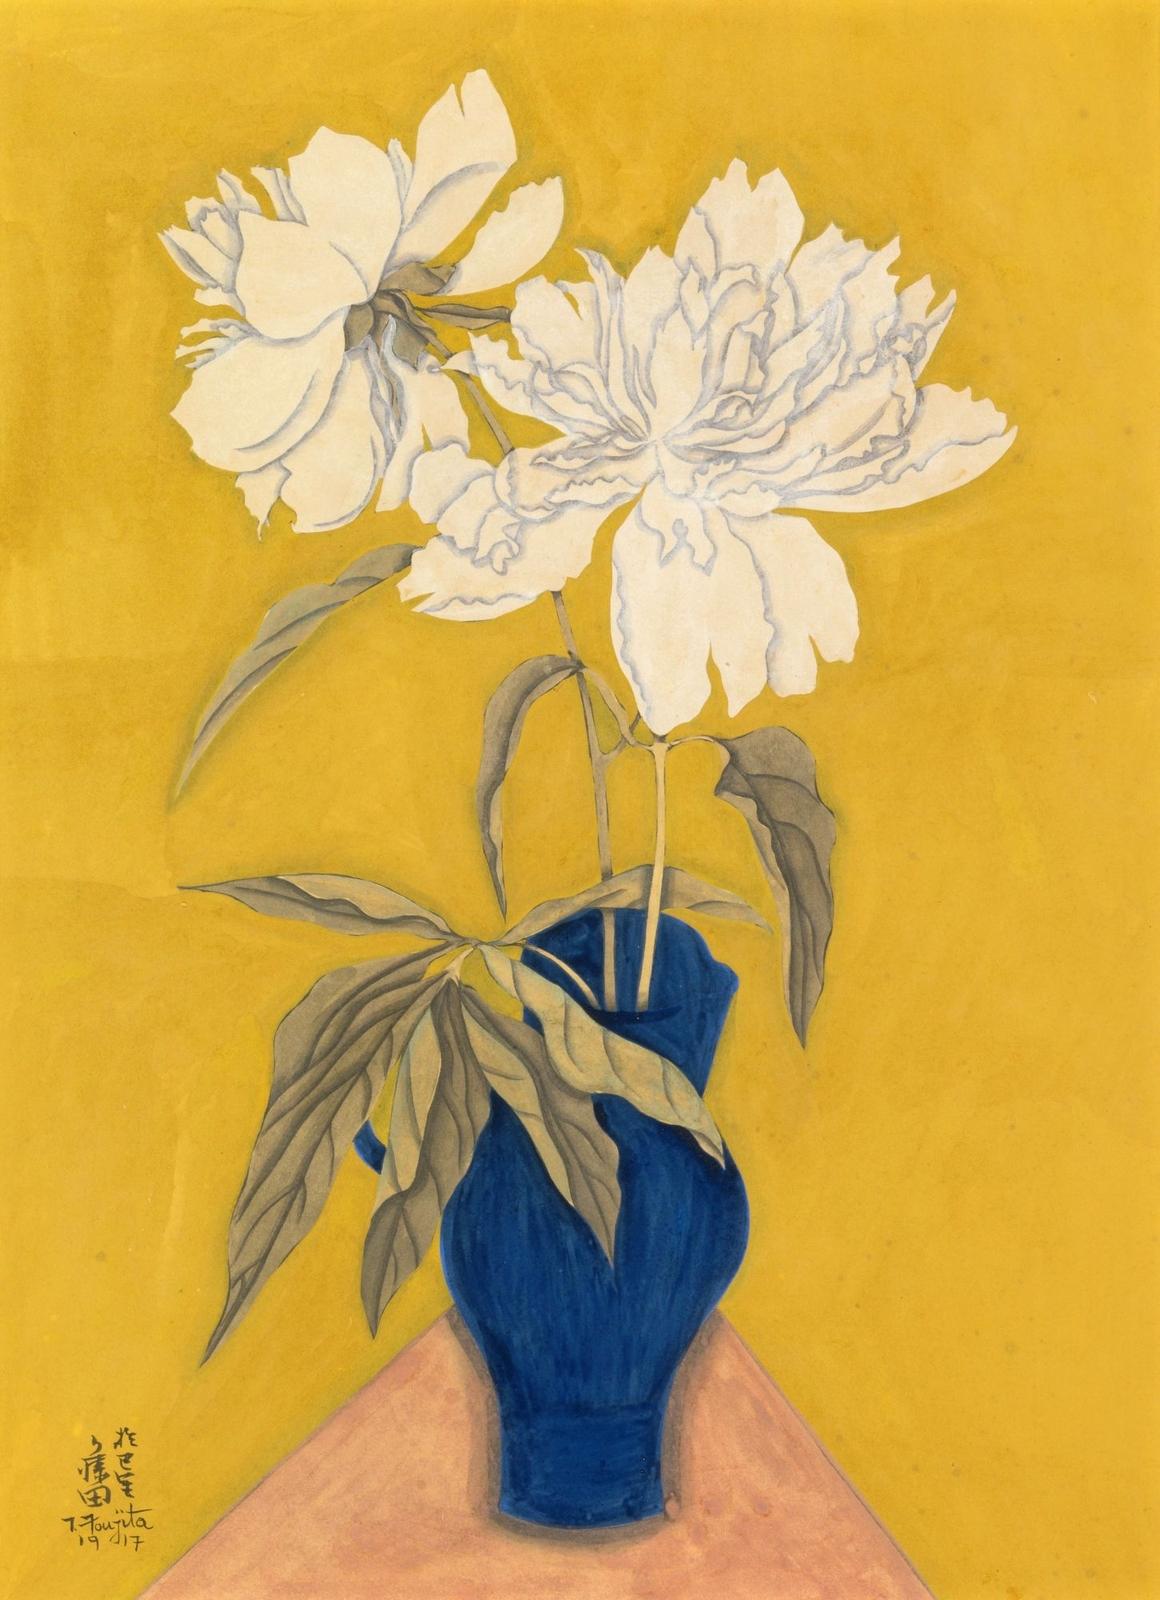 fujita tsuguharu and innovation in japan essay